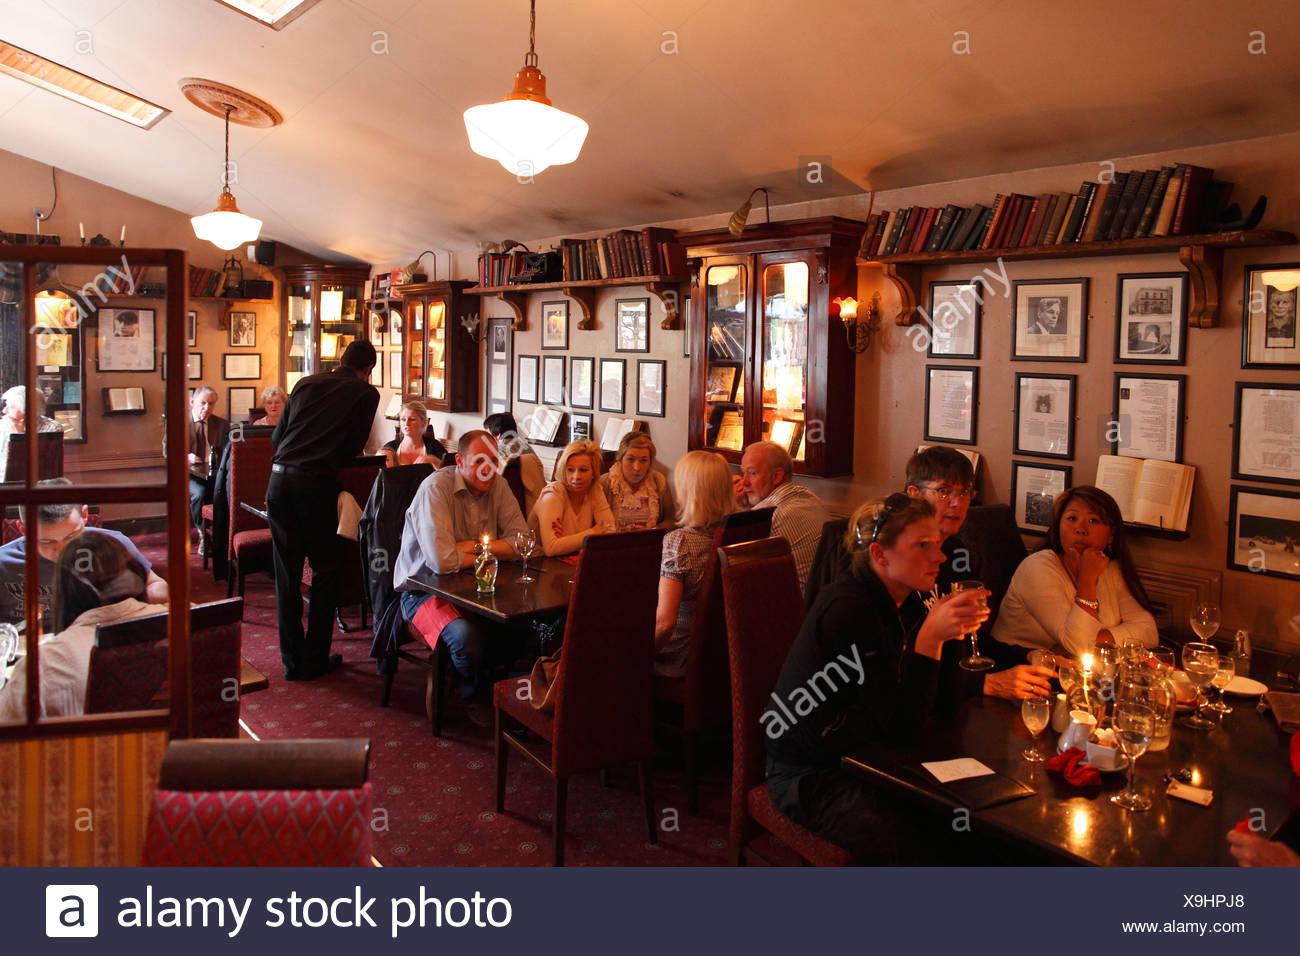 The Wicklow Heather Restaurant, Laragh, County Wicklow, Republic of Ireland, British Isles, Europe - Stock Image